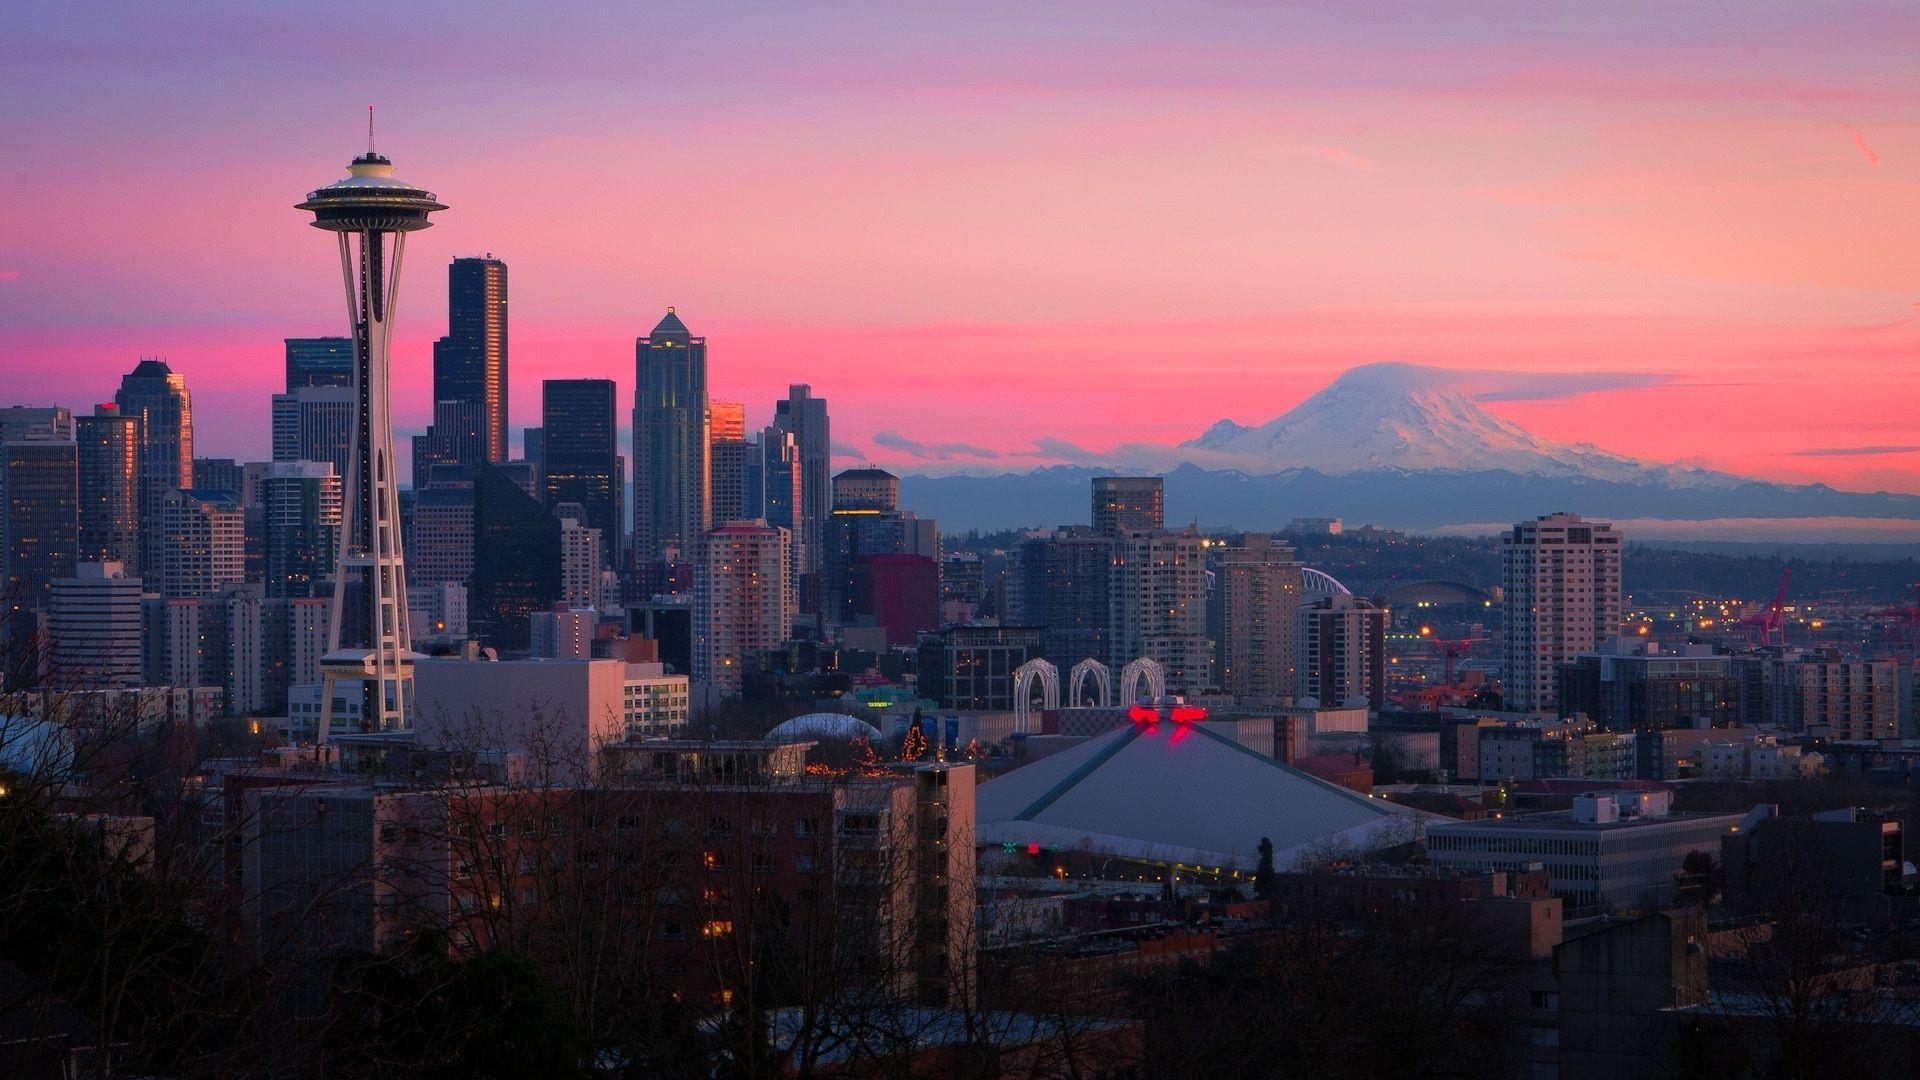 Seattle Wallpaper Store – Find Wonderful Picture designs